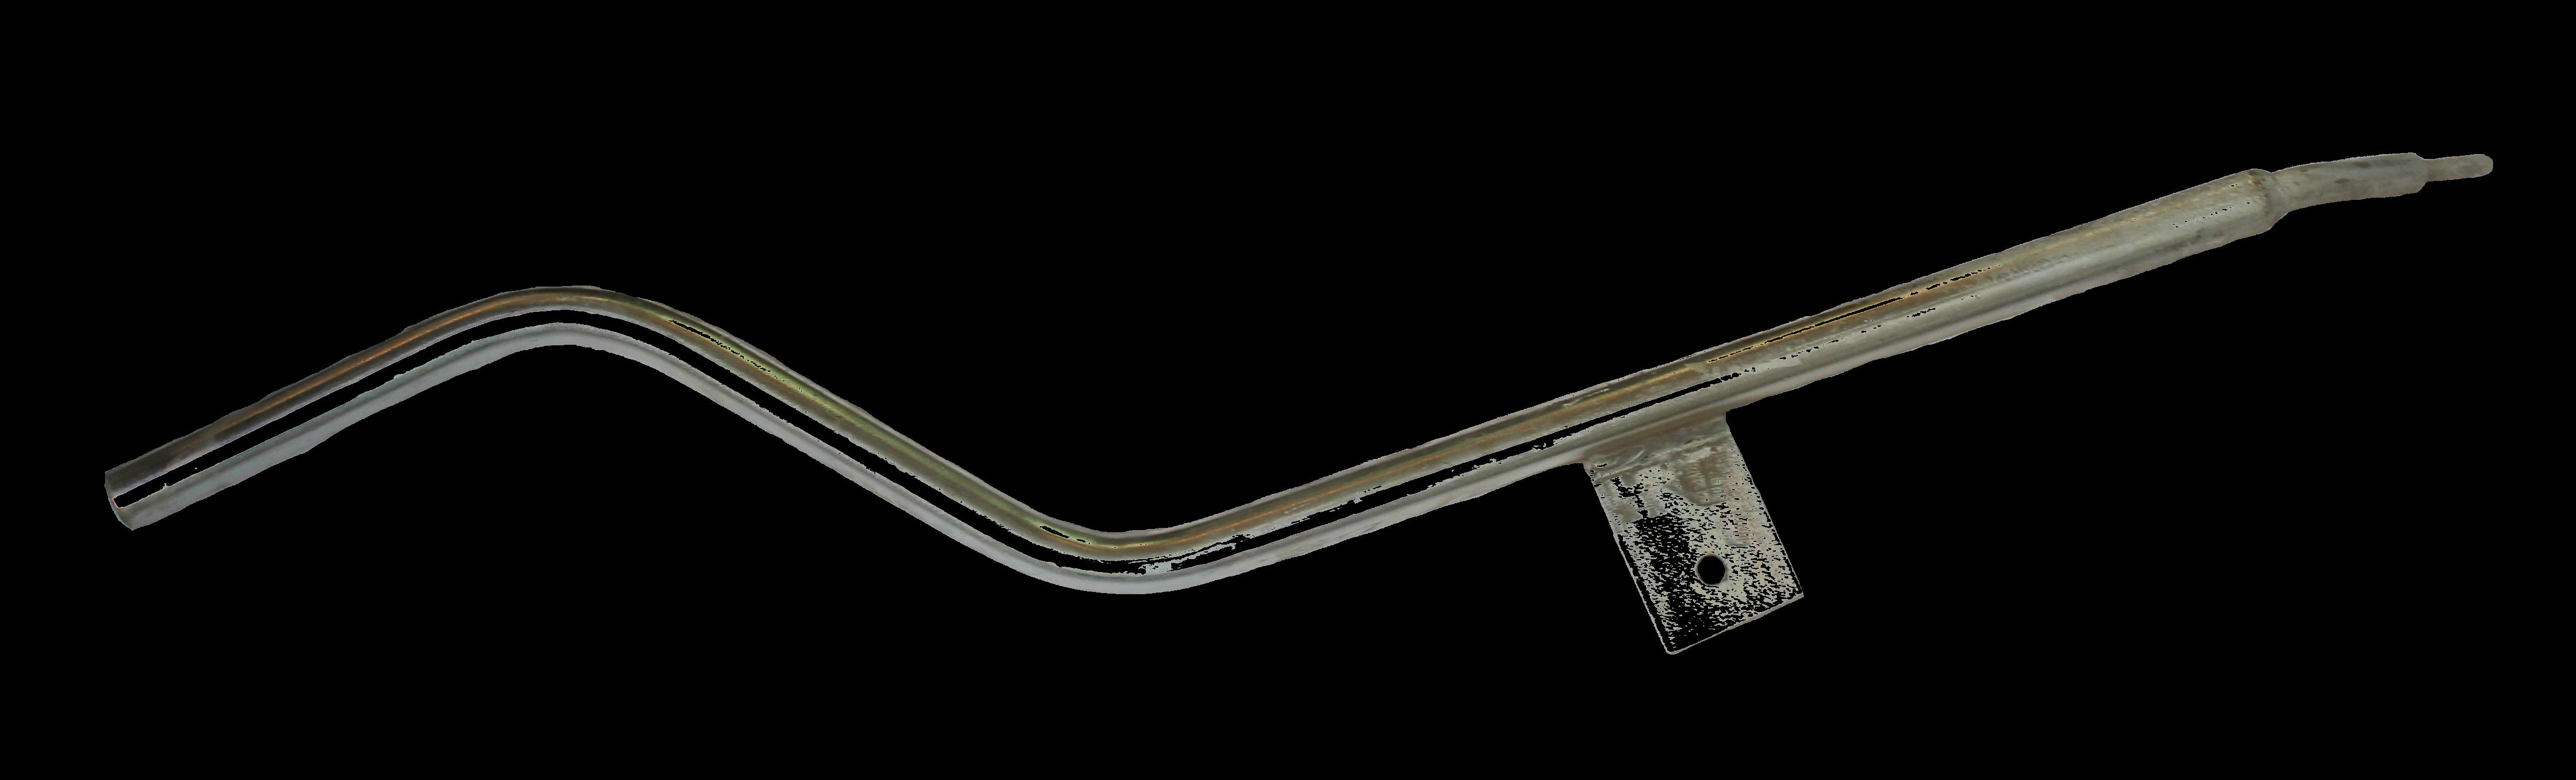 SP100-012